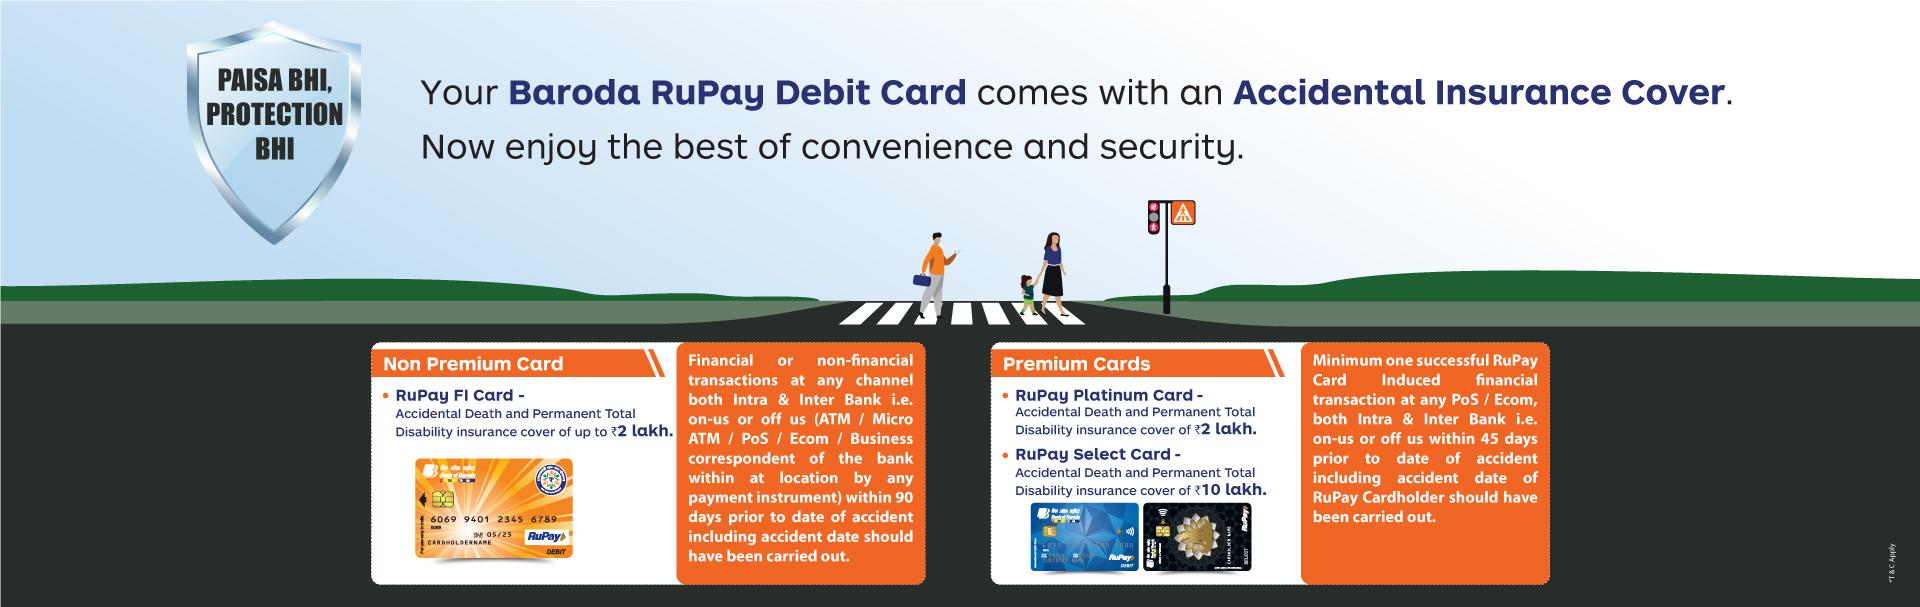 RuPay Debit Card-Accidental Insurance